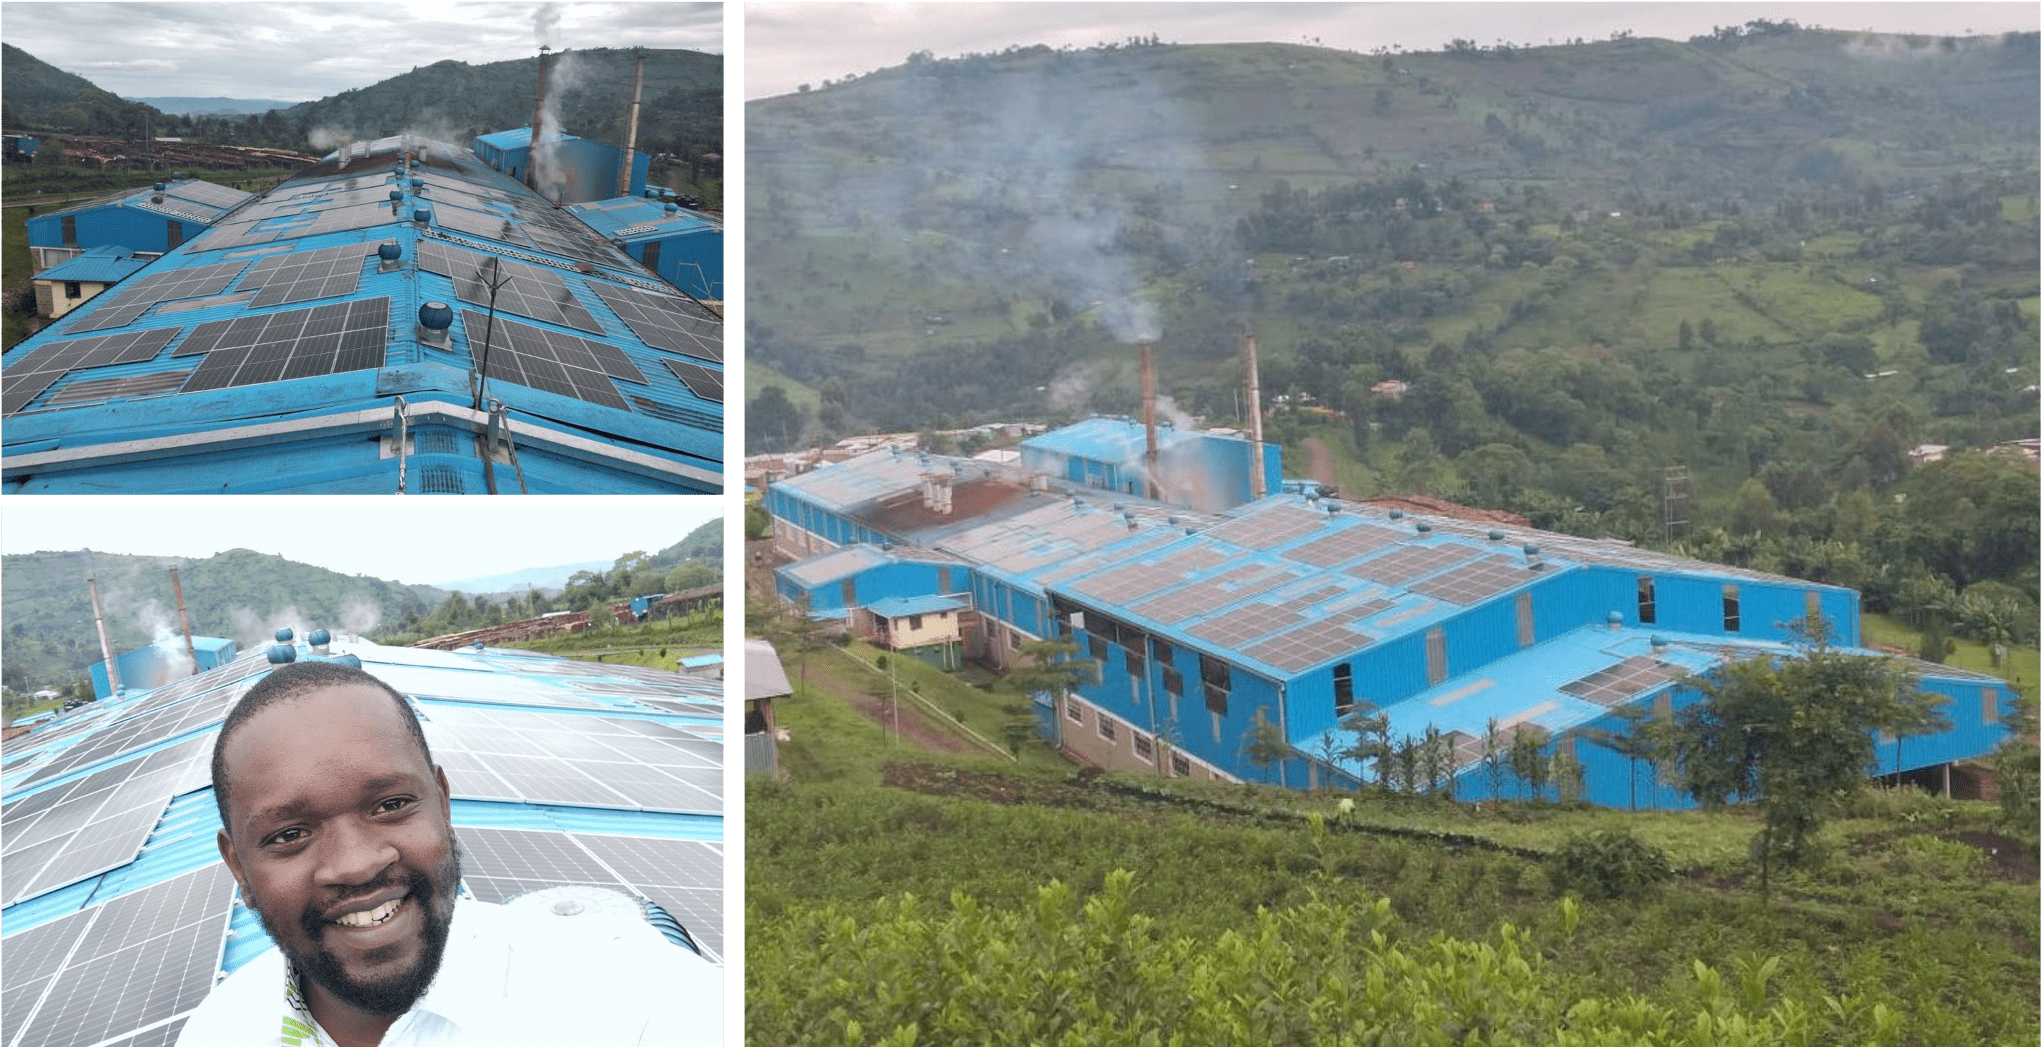 Mbogo Valley Tea